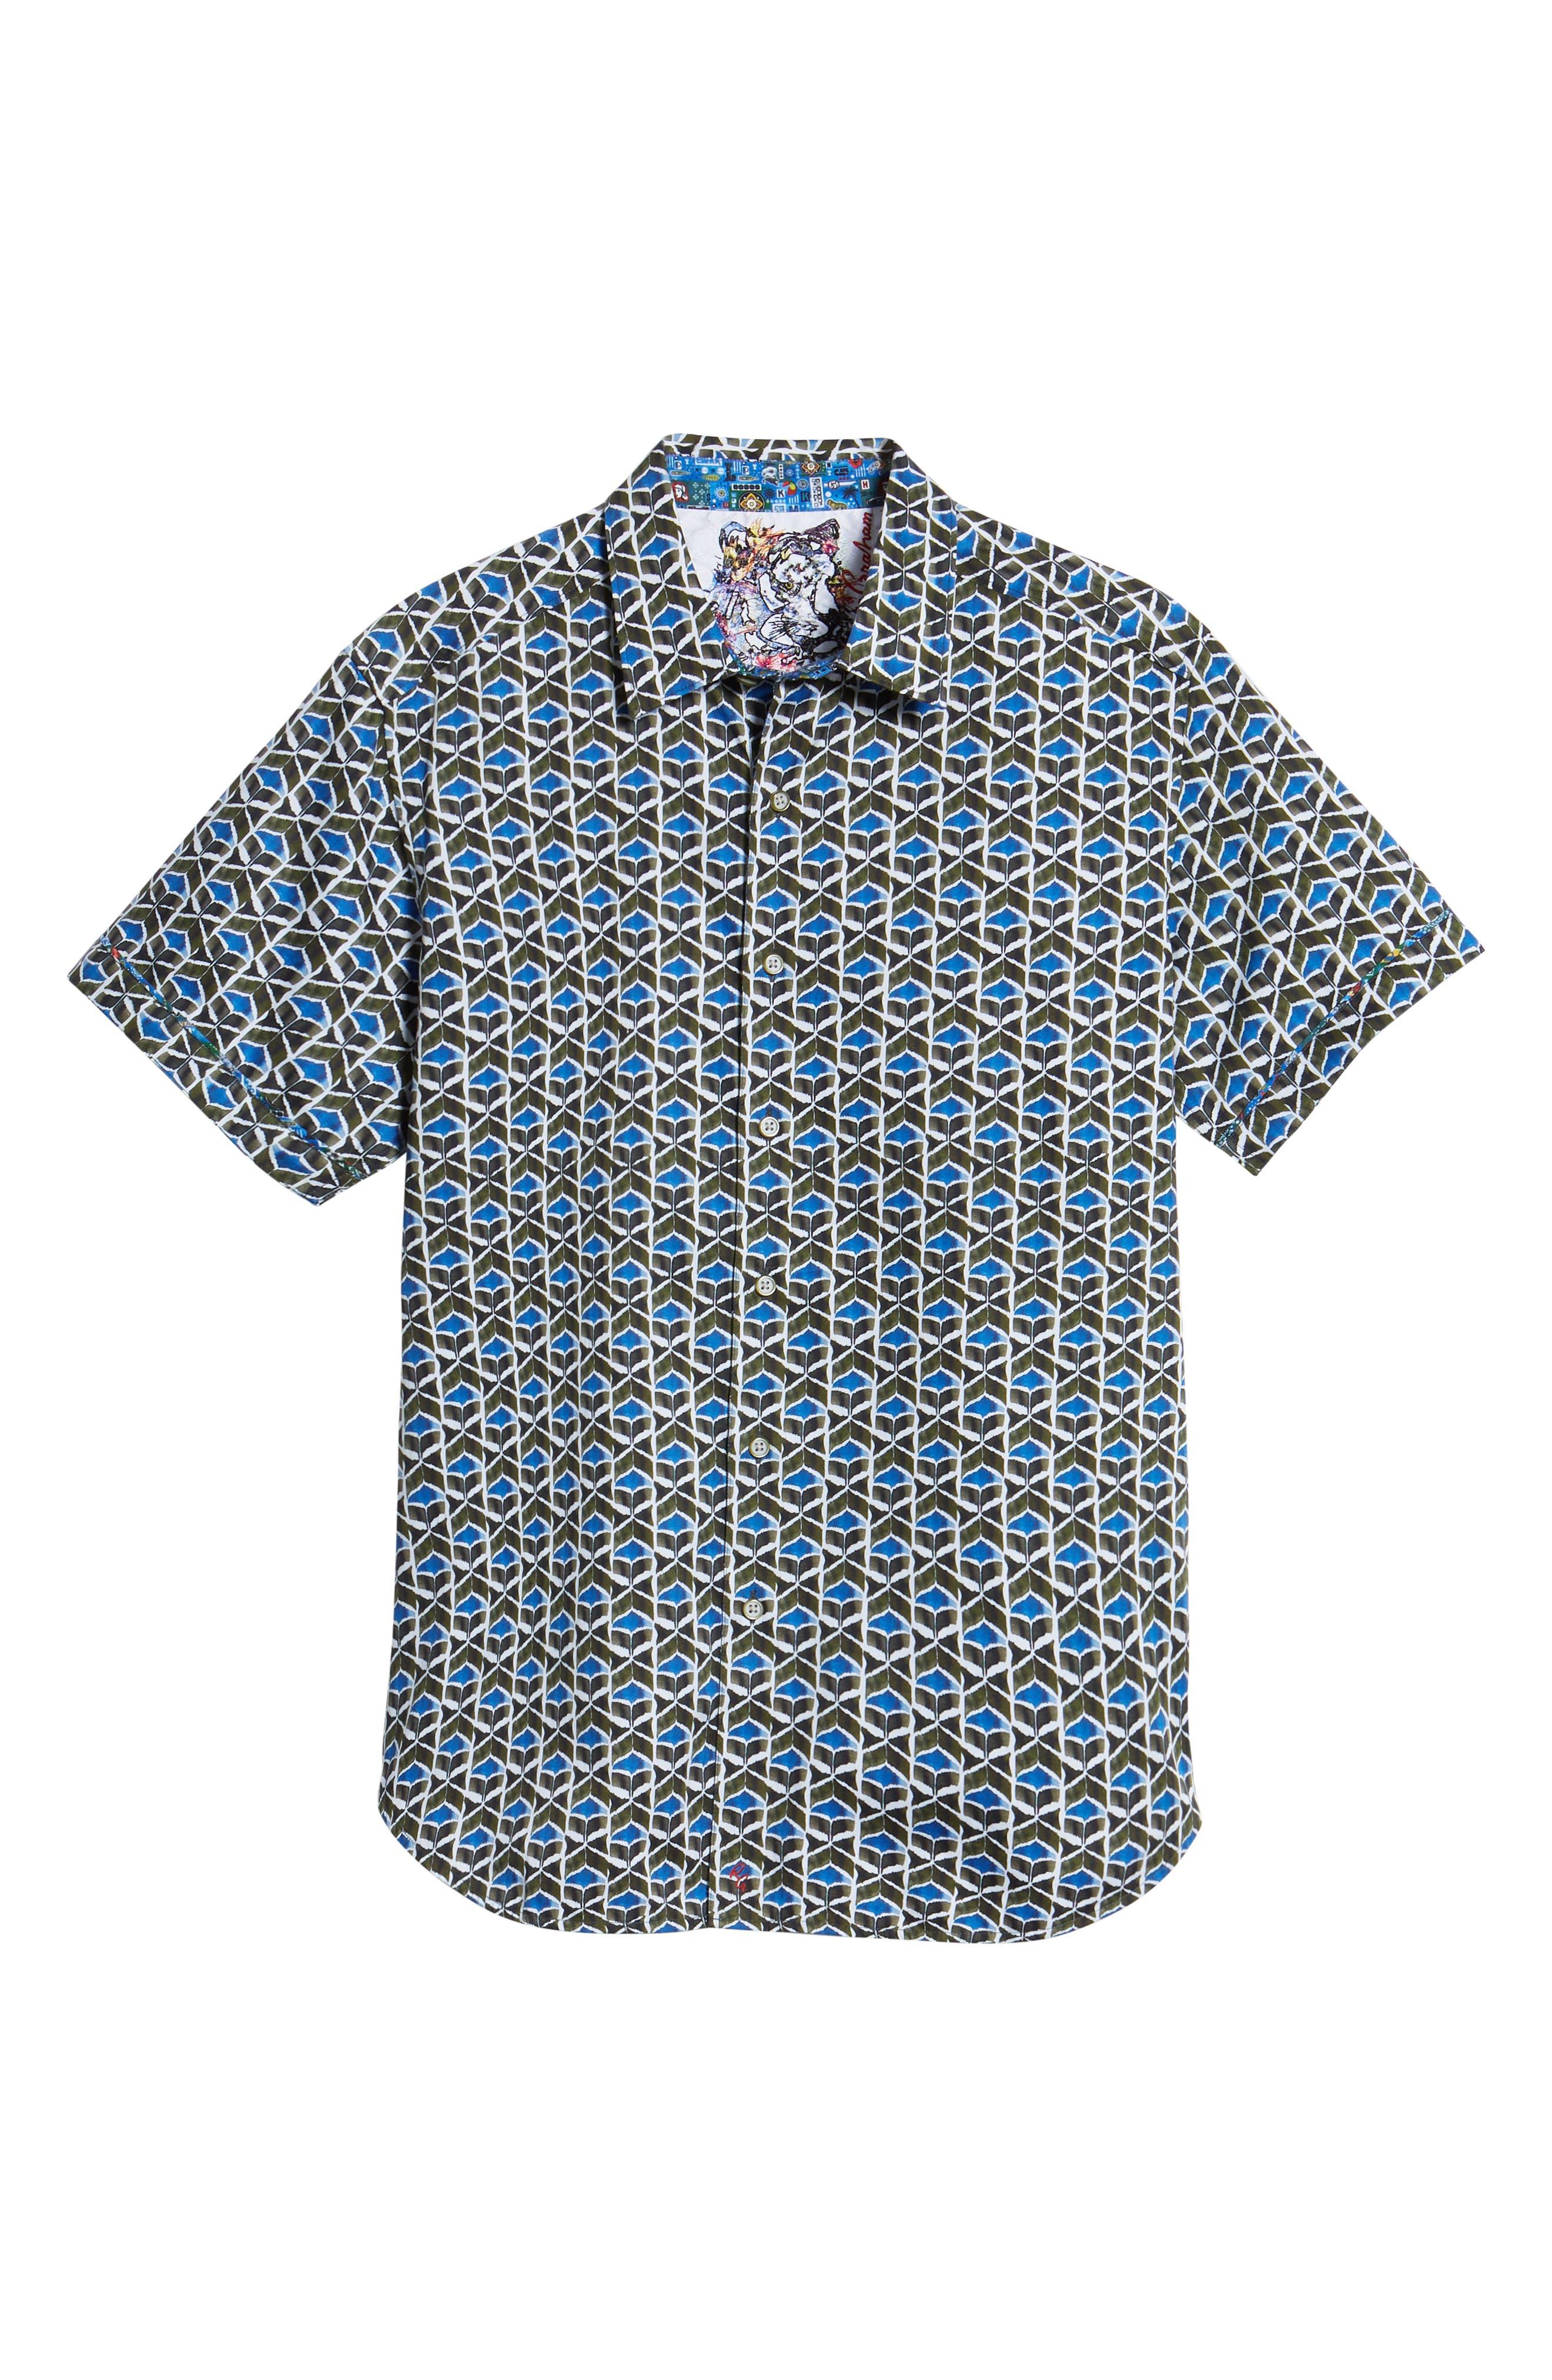 Tames Classic Fit Sport Shirt,                             Alternate thumbnail 6, color,                             300